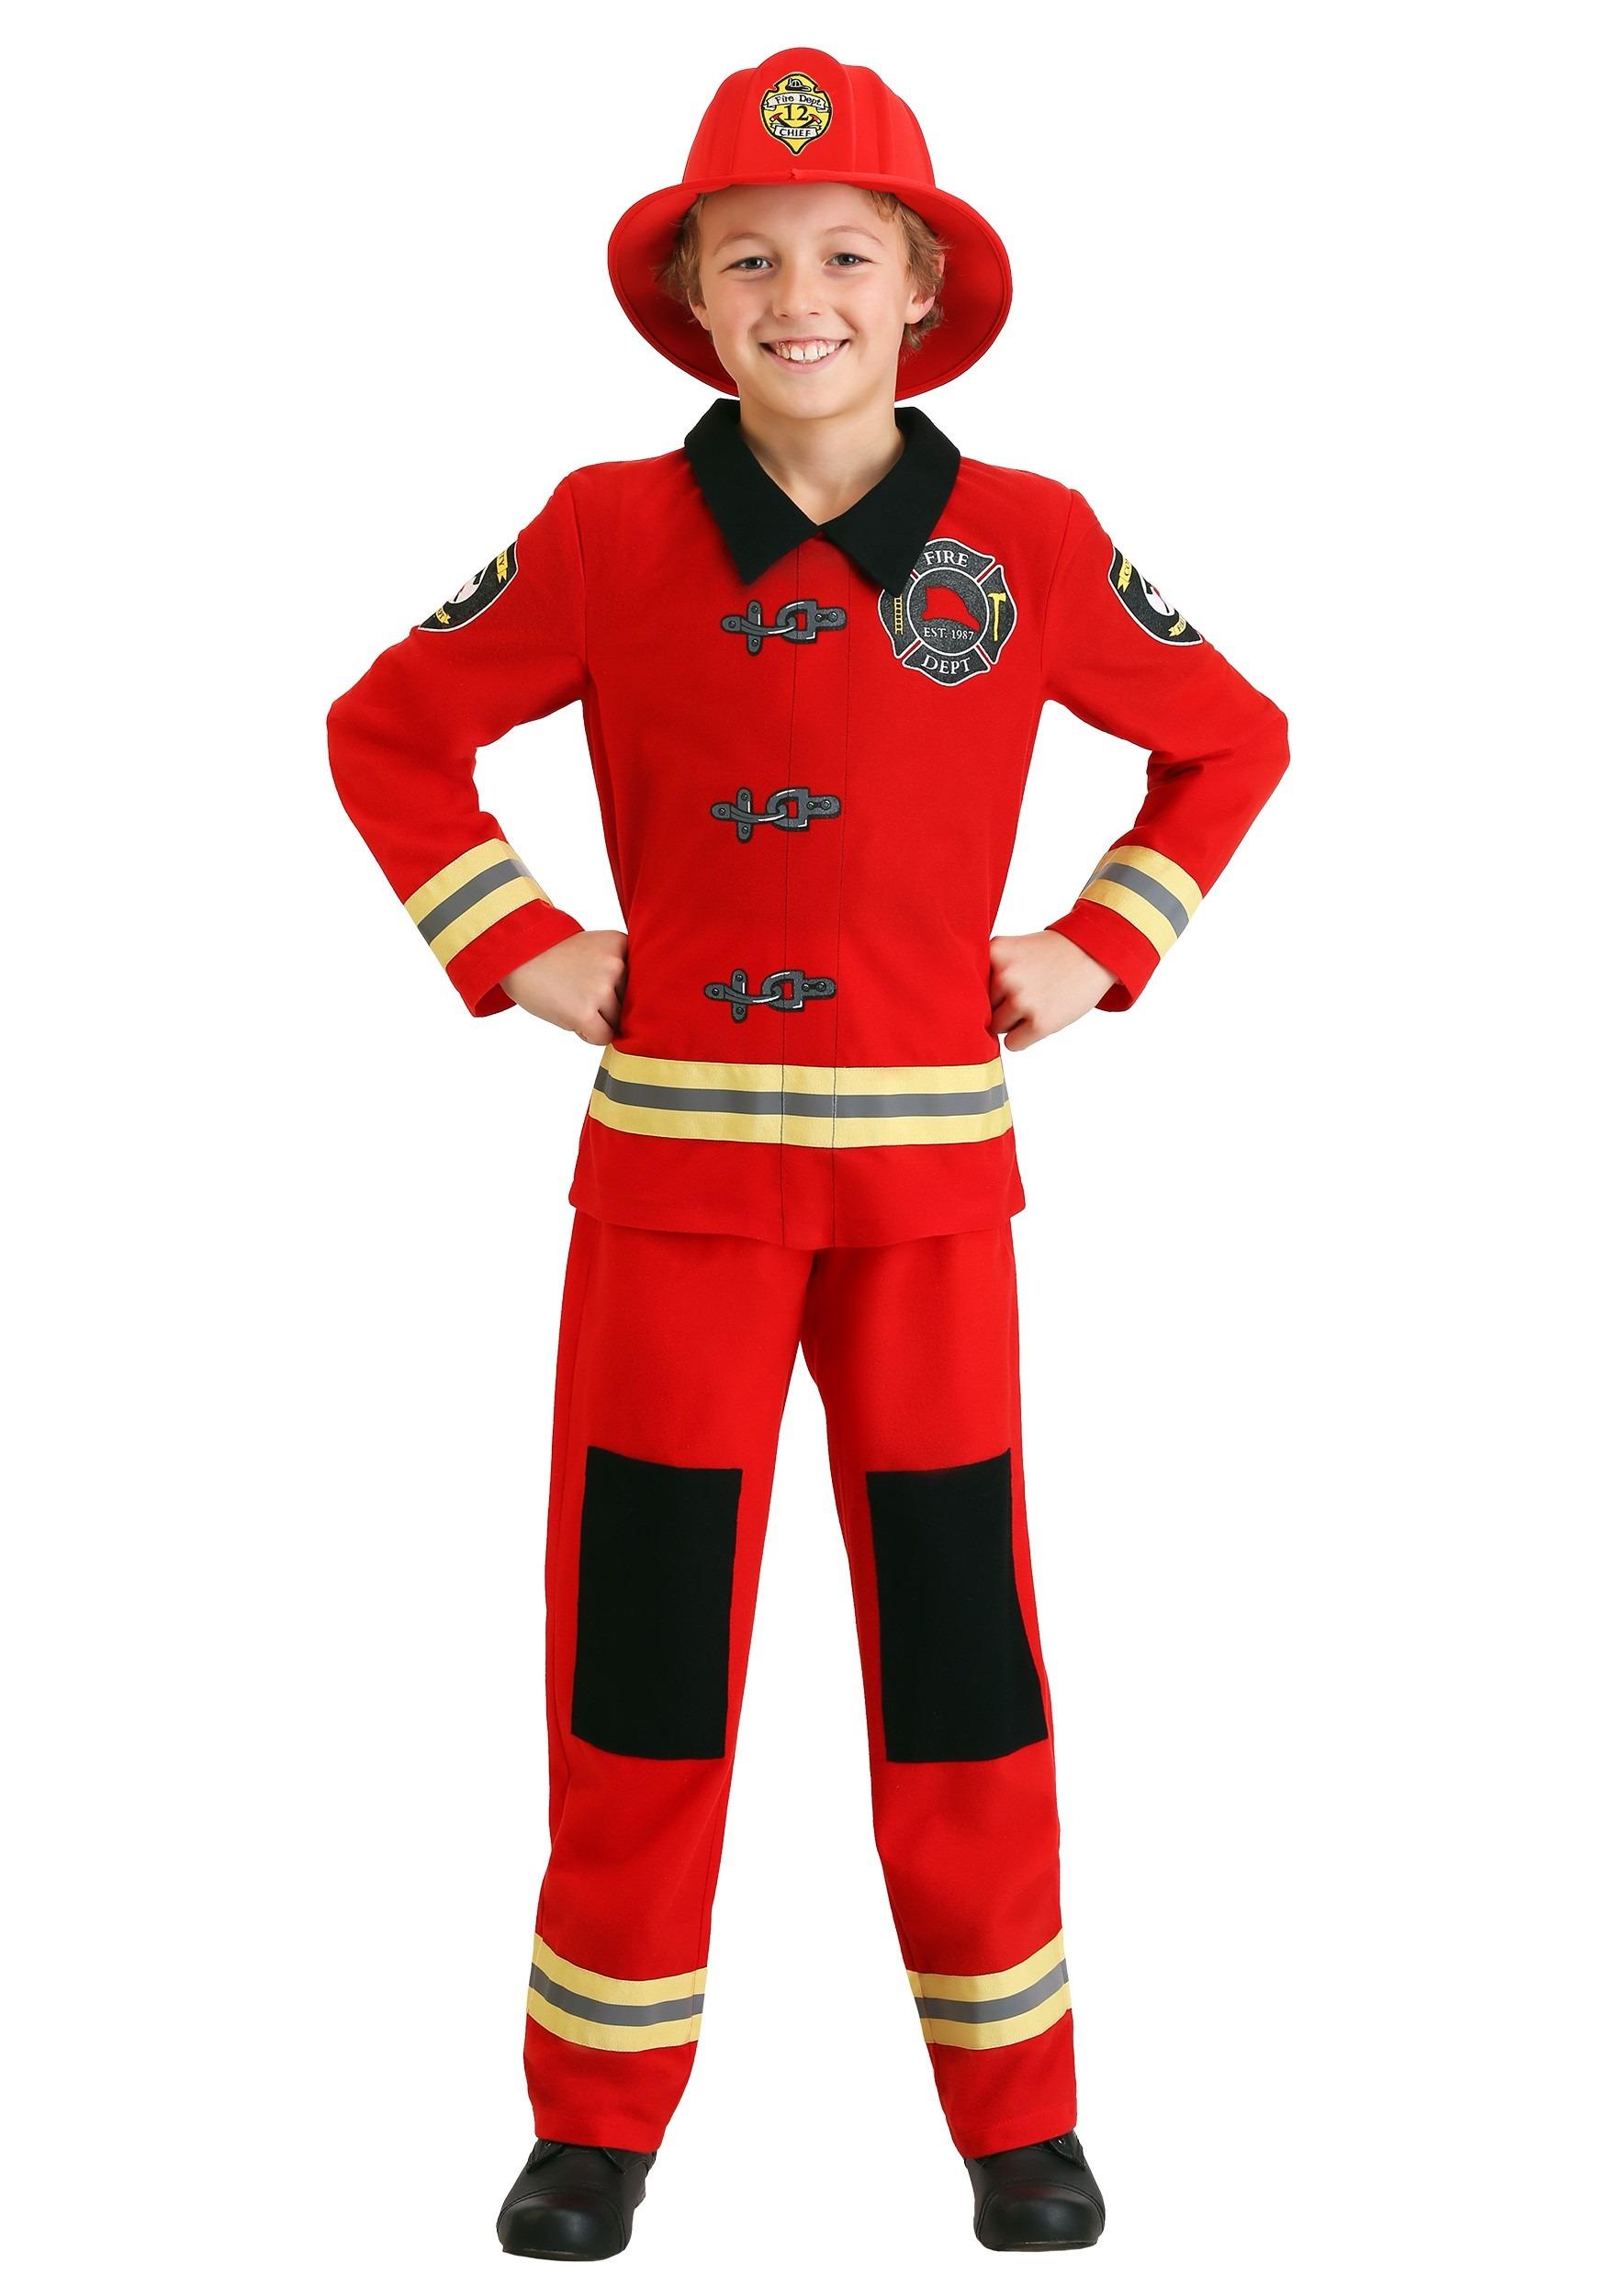 Friendly Firefighter Costume for Kids